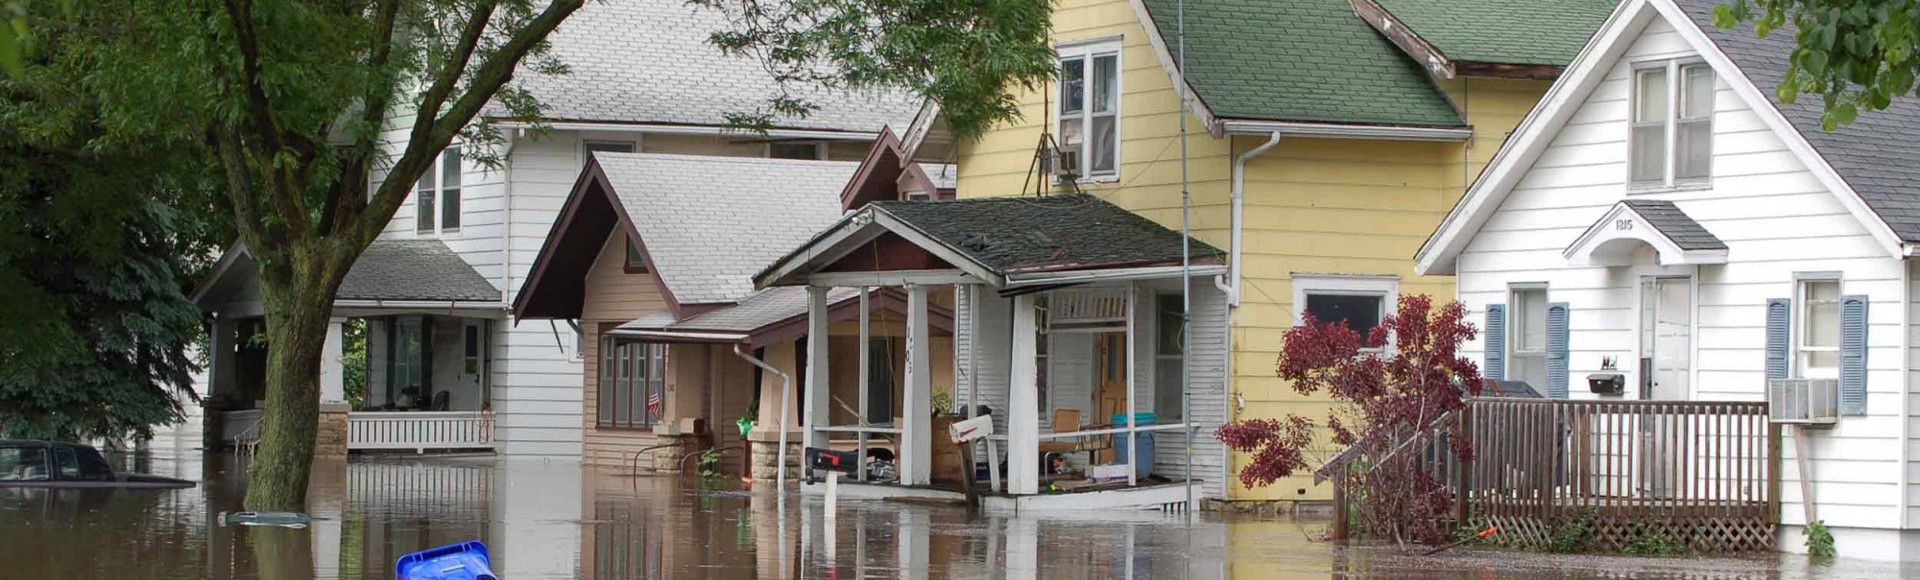 Flood Damage Repair Augusta GA Mold remediation   Dependable Remediation Services